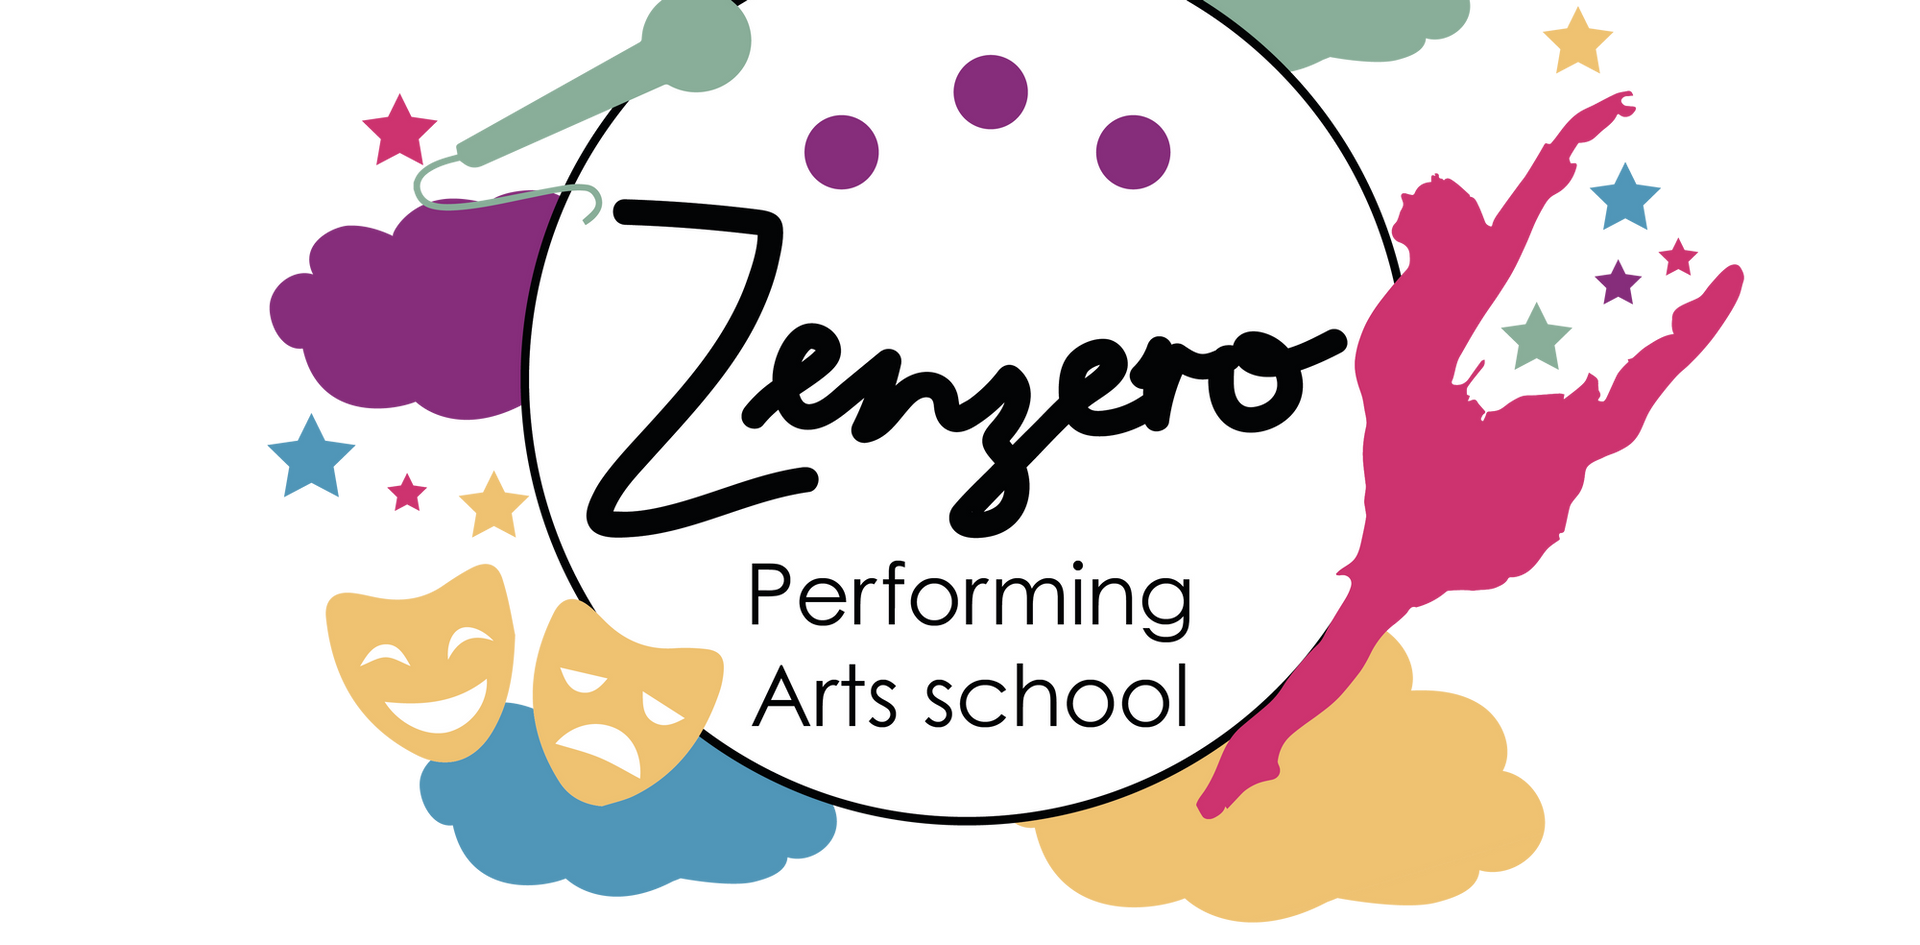 logo zenzero-01.png